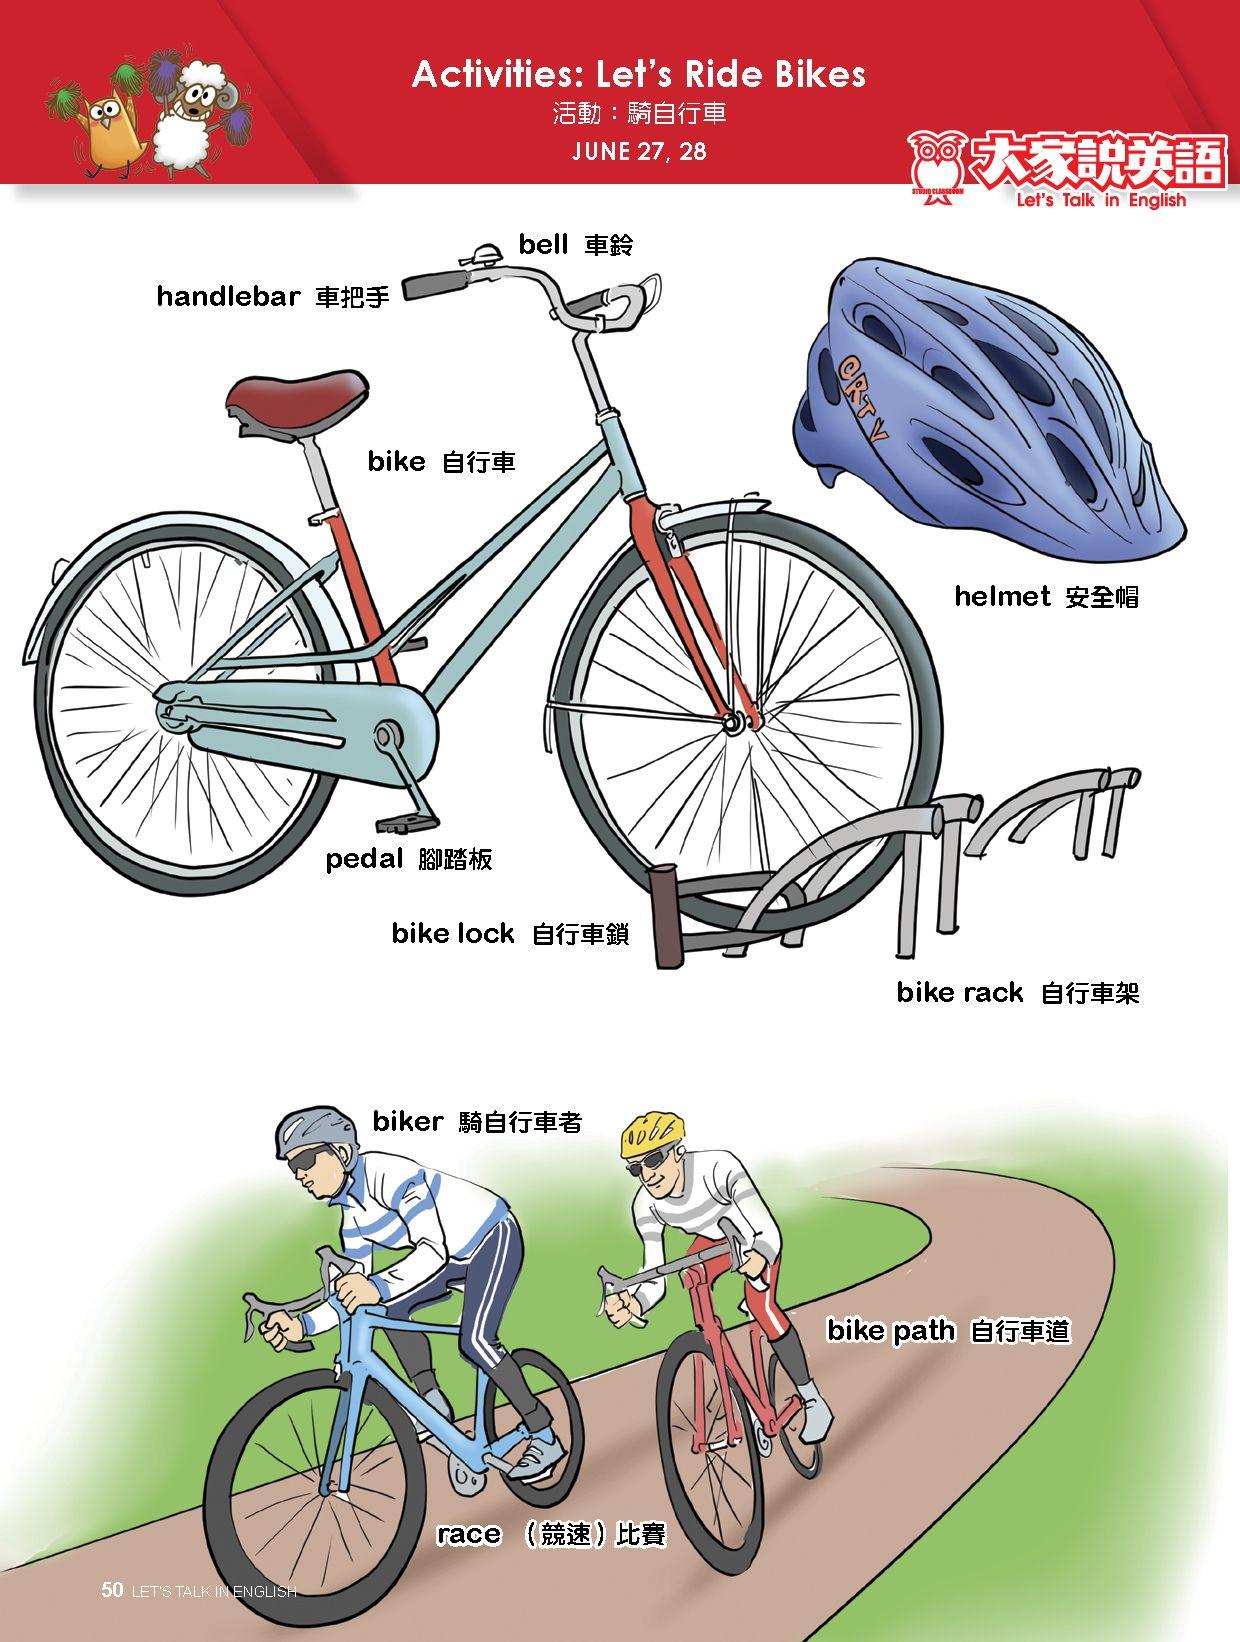 【Visual English】Activities: Let's Ride Bikes   english